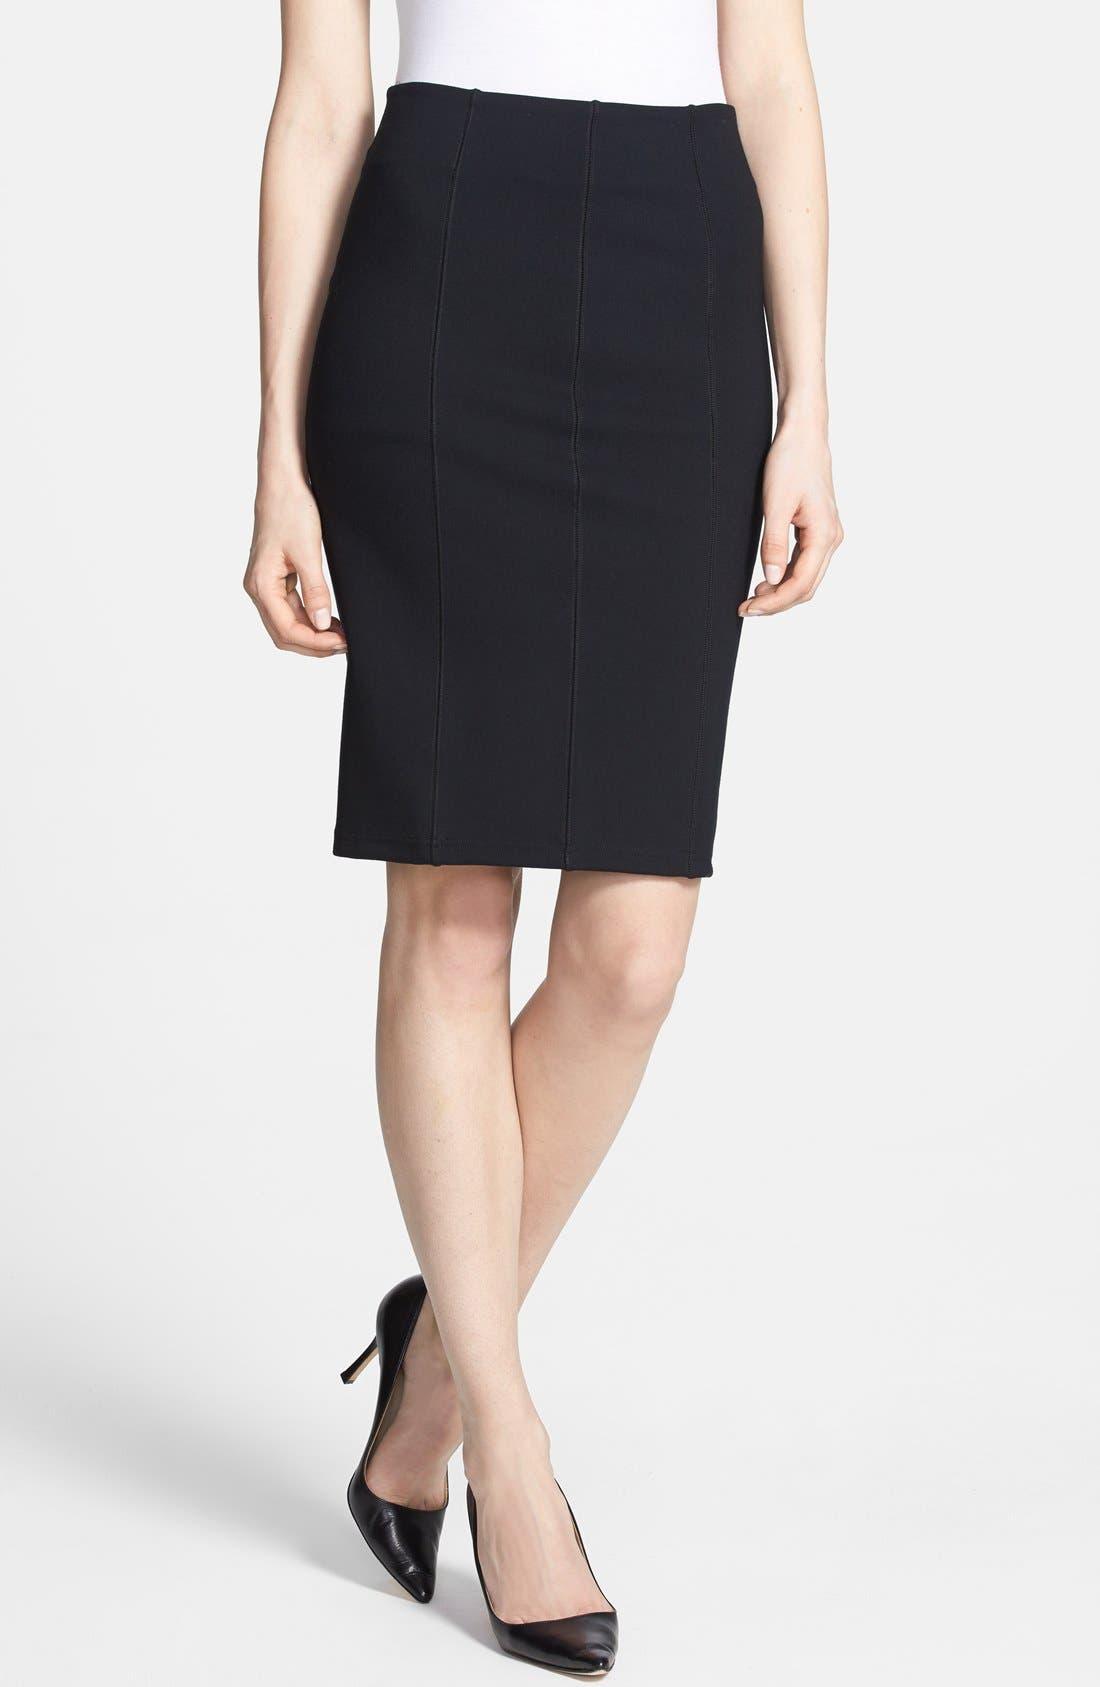 Alternate Image 1 Selected - Trouvé Seam Detail Pencil Skirt